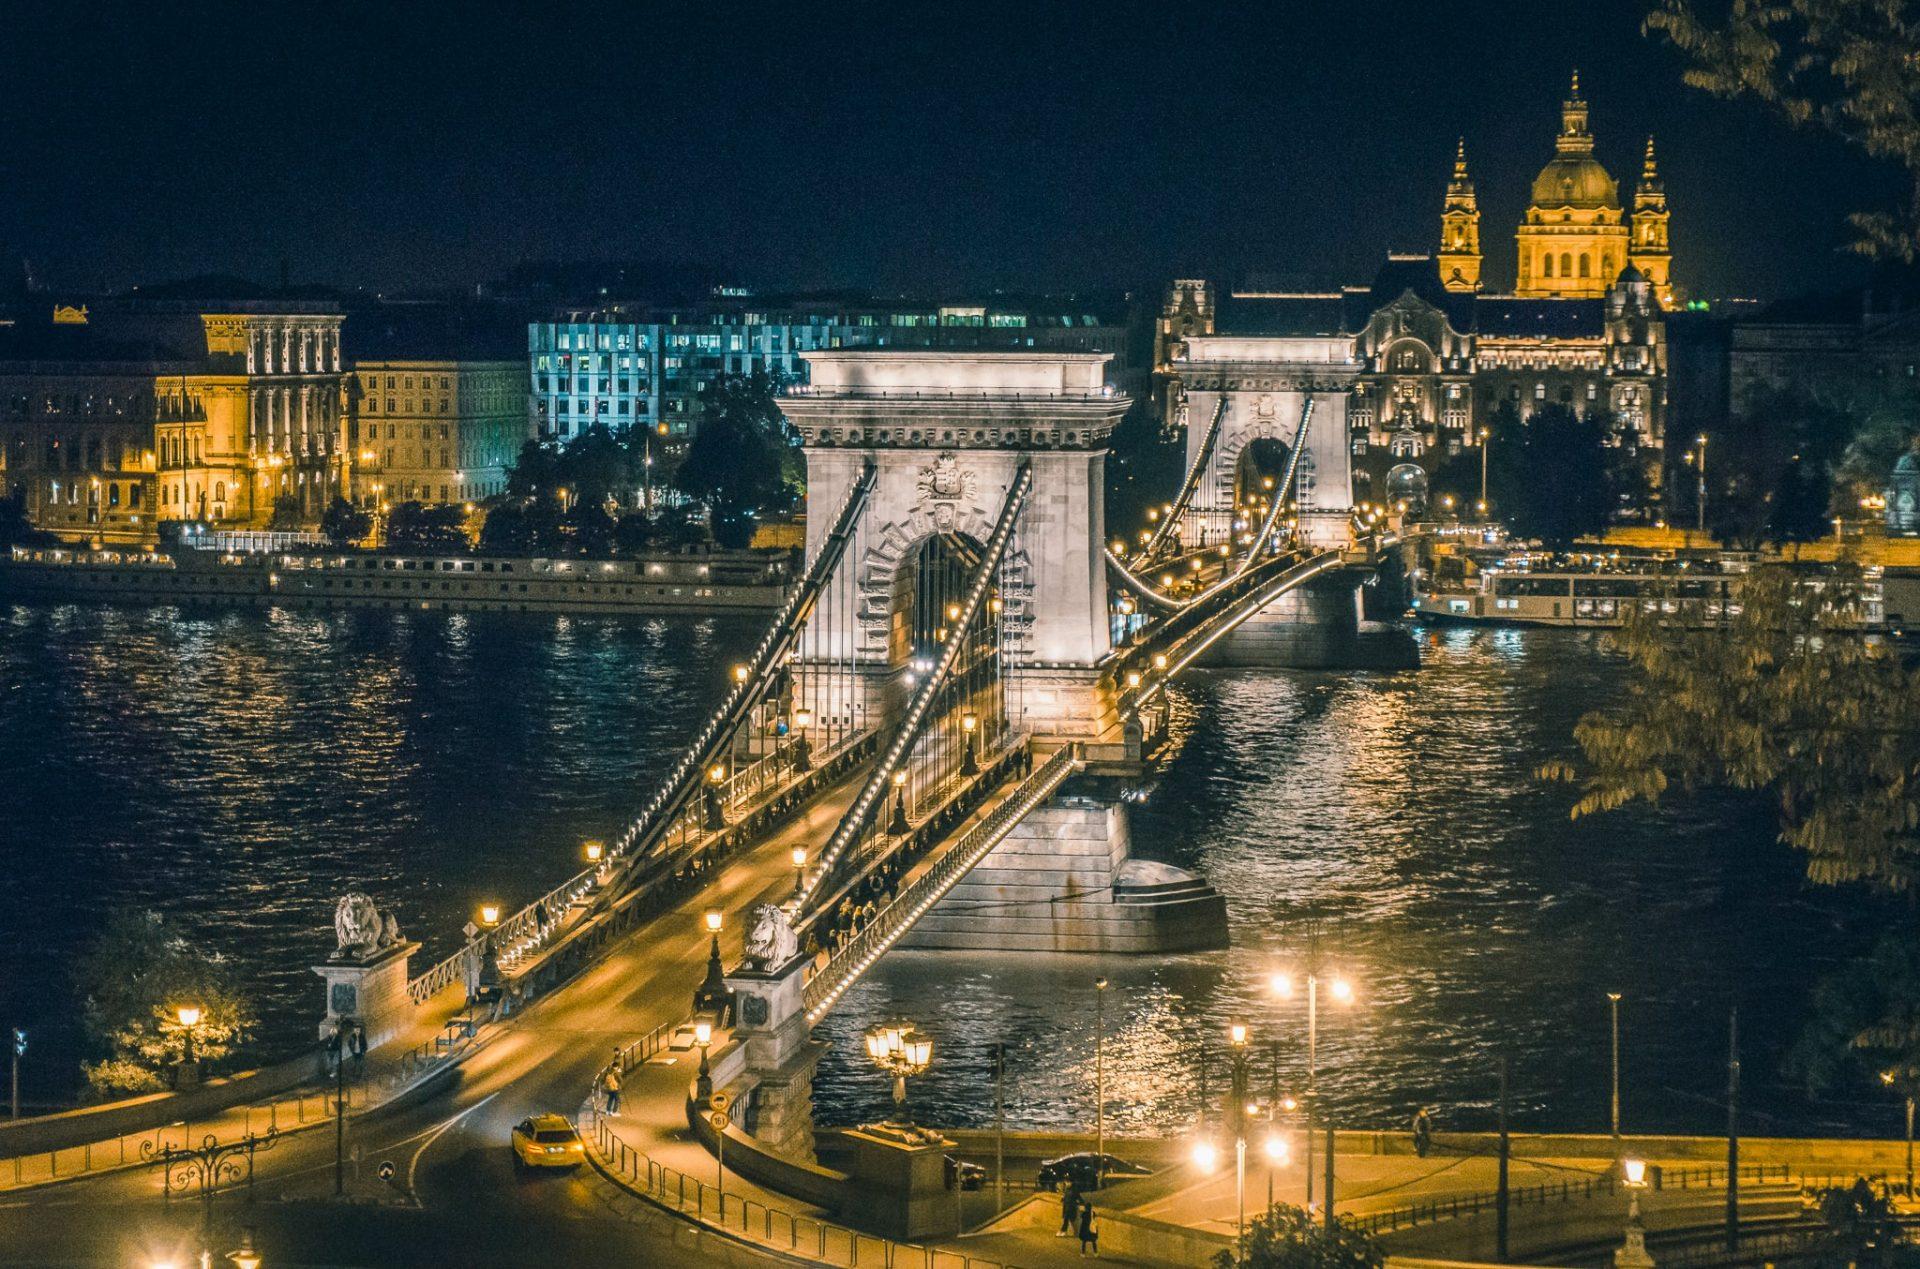 Széchenyi Chain Bridge - night view - Budapest